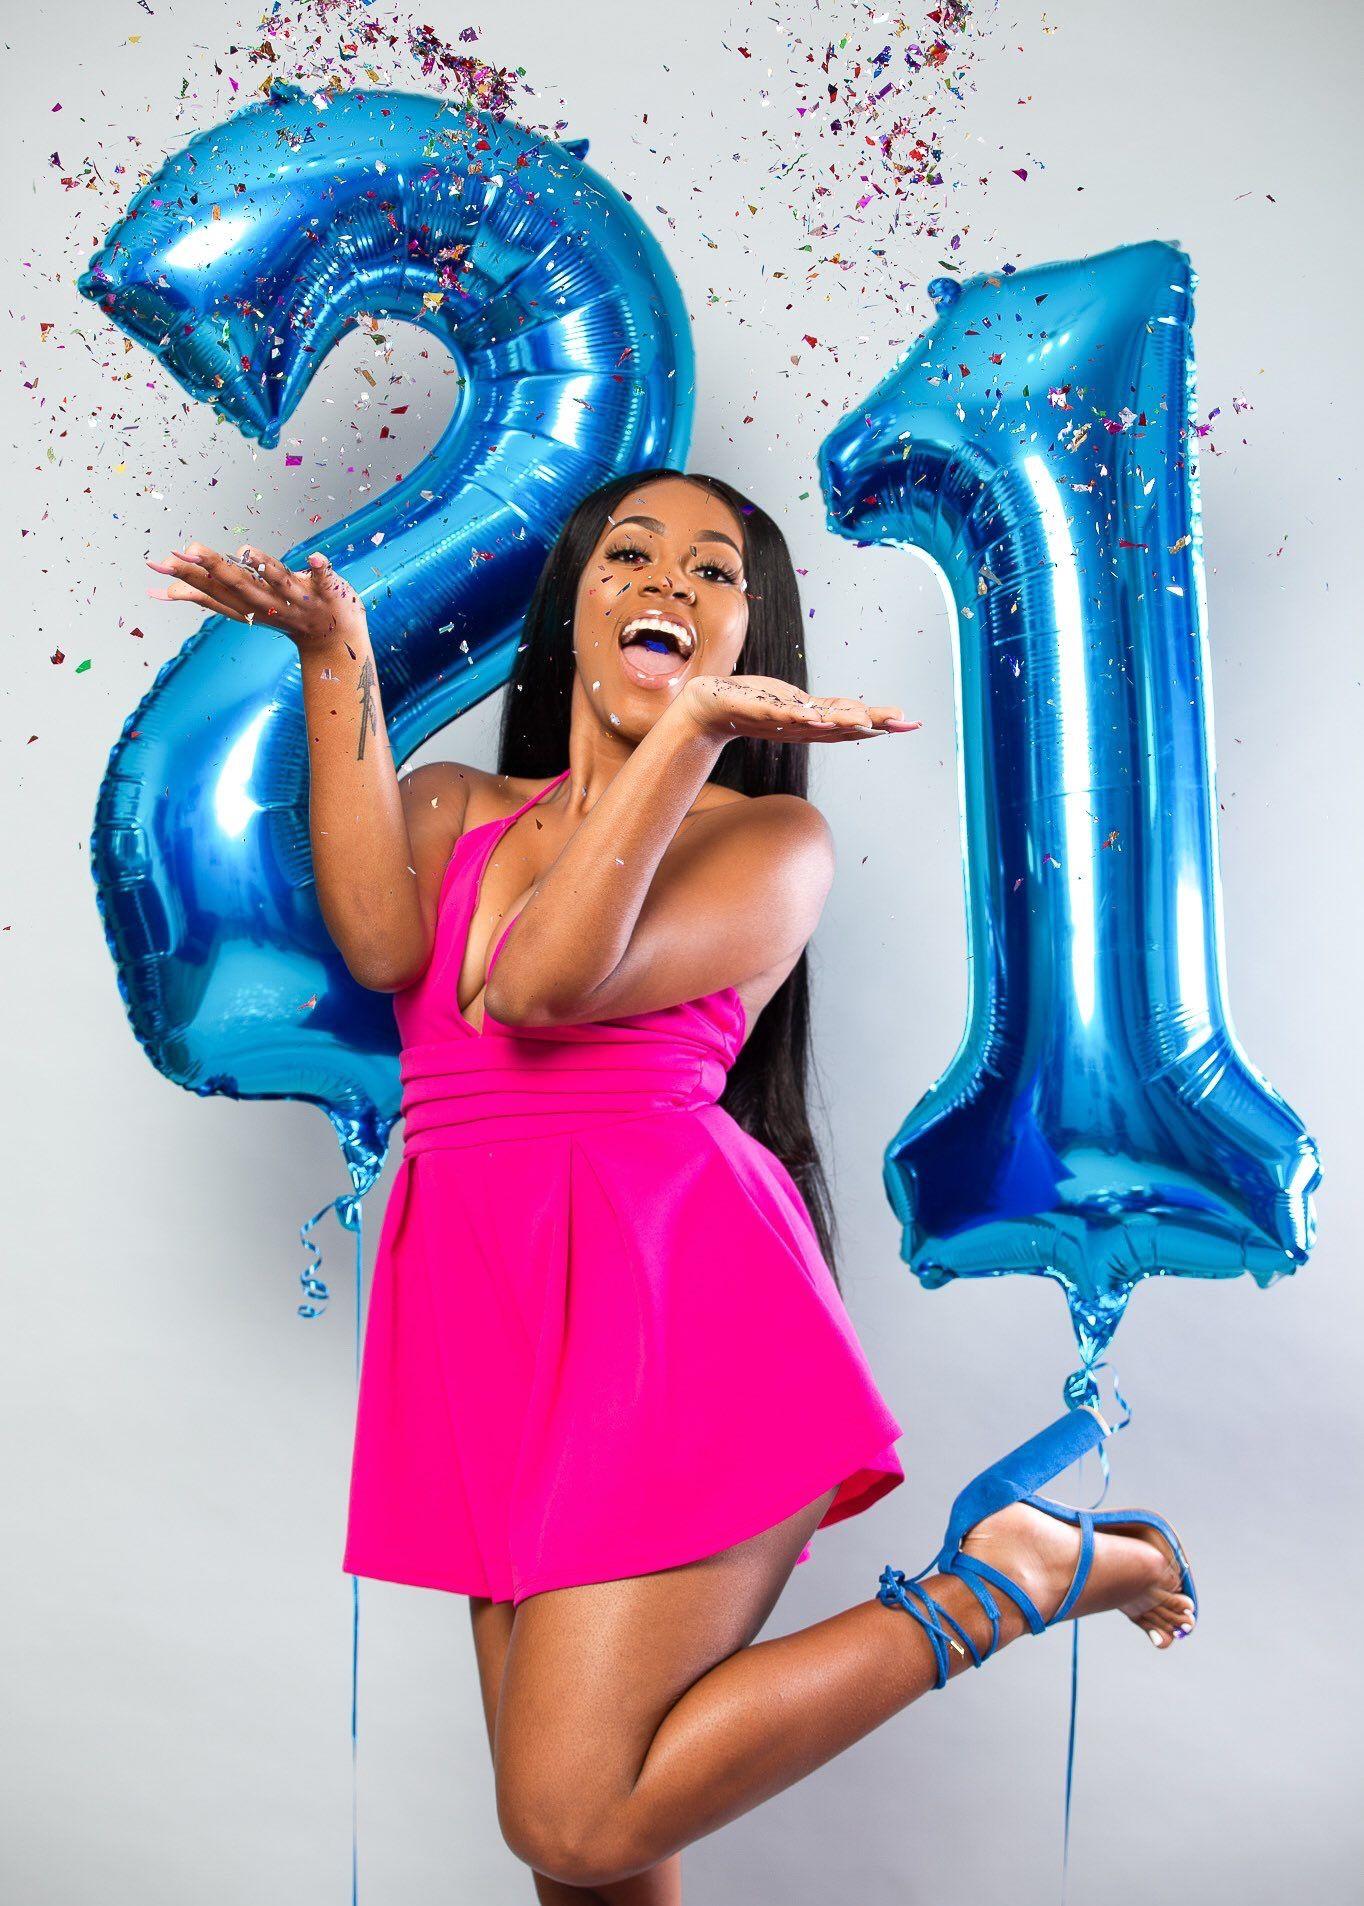 Pin By Chuks Imegwu On Birthday Shoot 21st Birthday Girl Birthday Photoshoot 21st Birthday Pictures #portrait #birthday #style #black n white @angelene van #kn kasi network photography #kn kasi network africa. pinterest